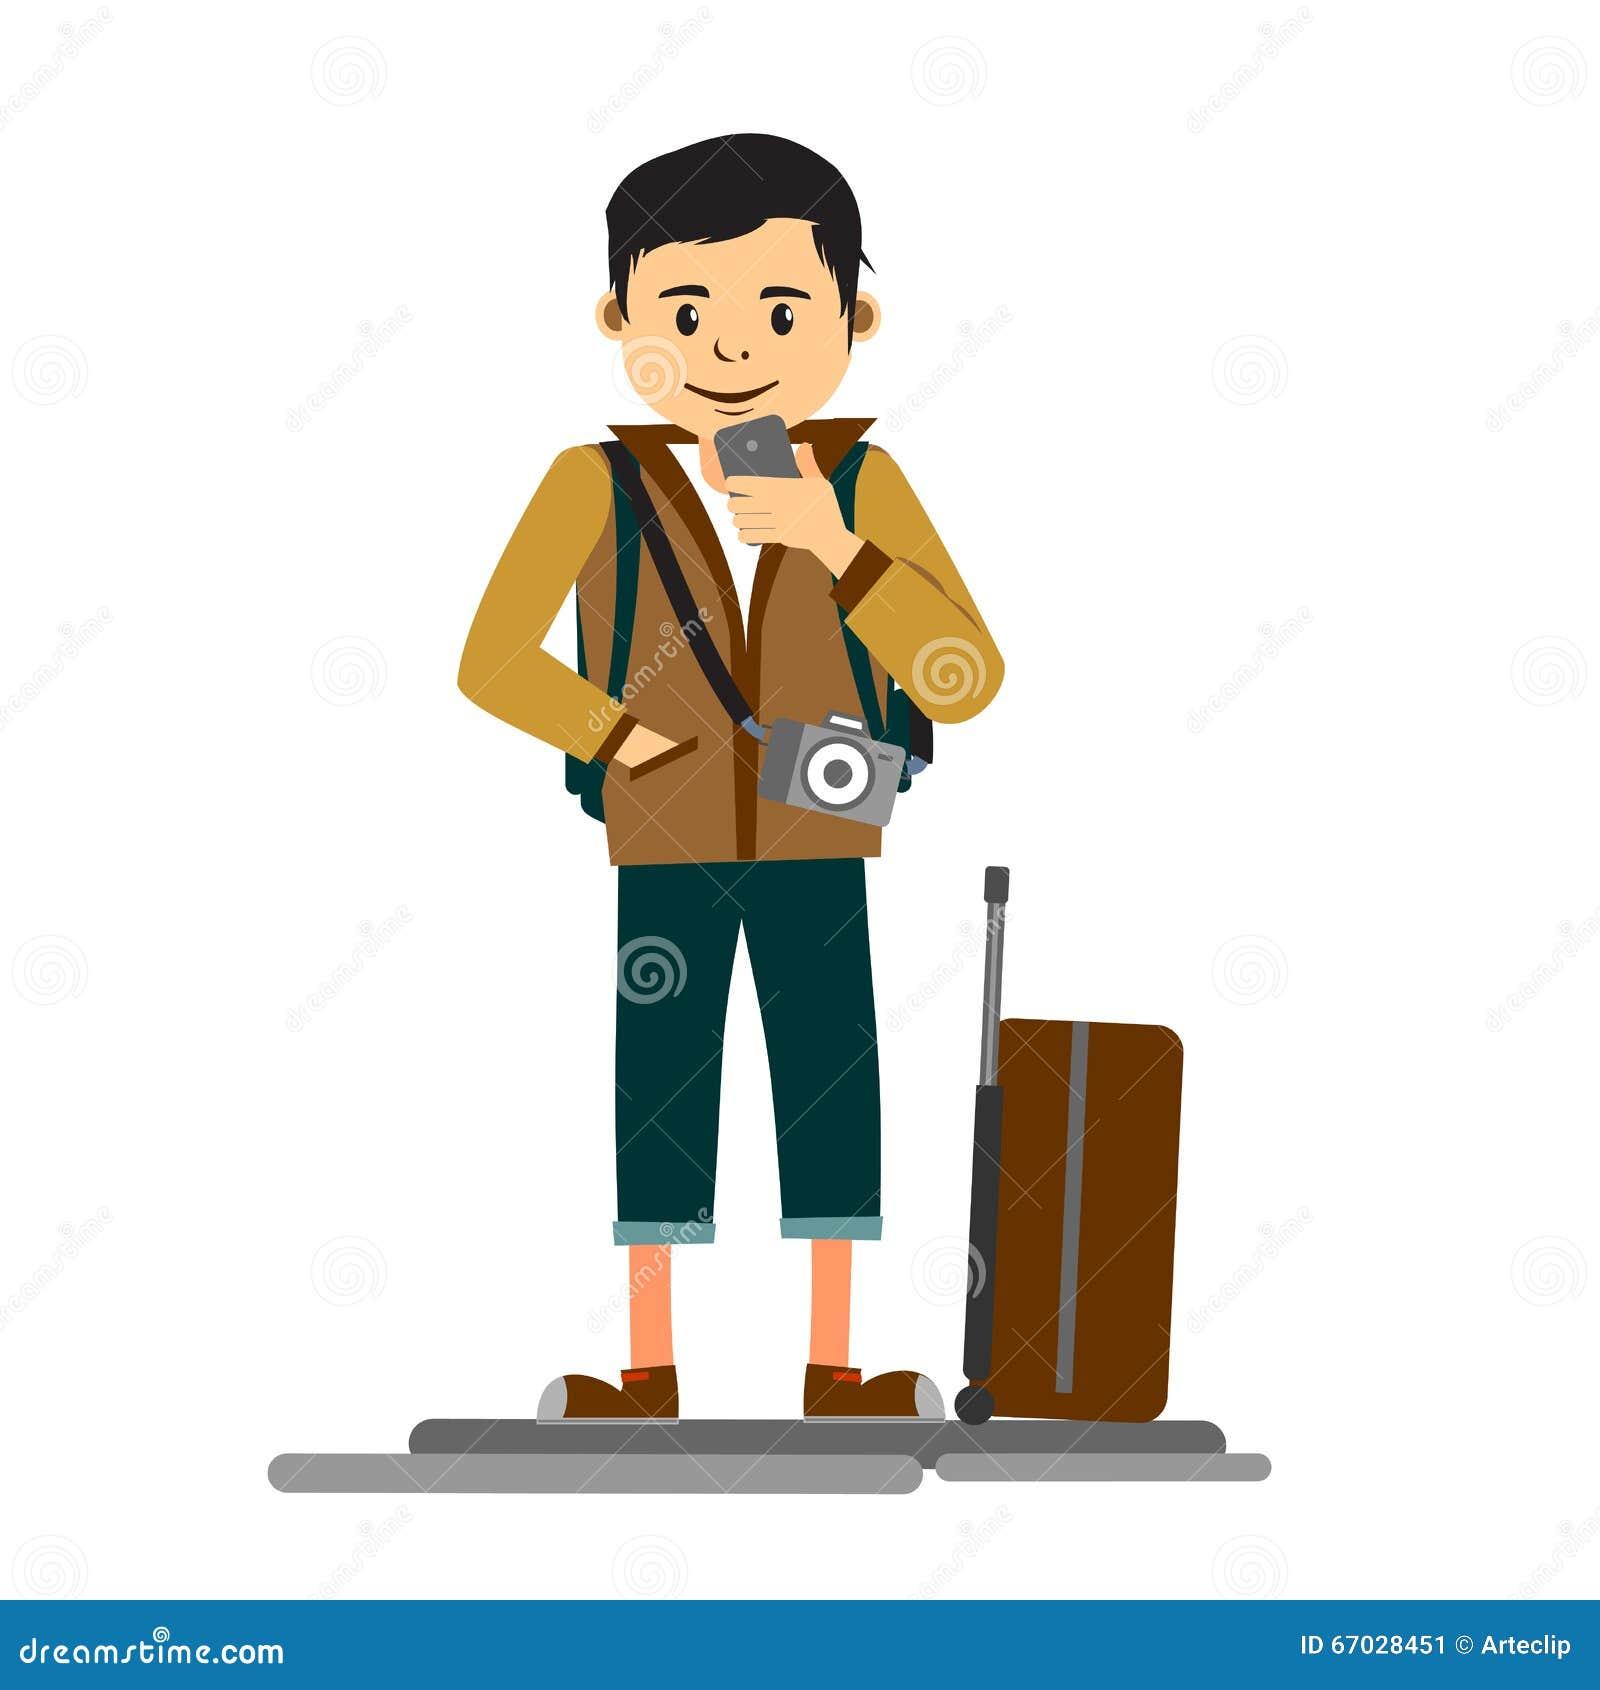 Young handsome man traveler or tourist flat illustration